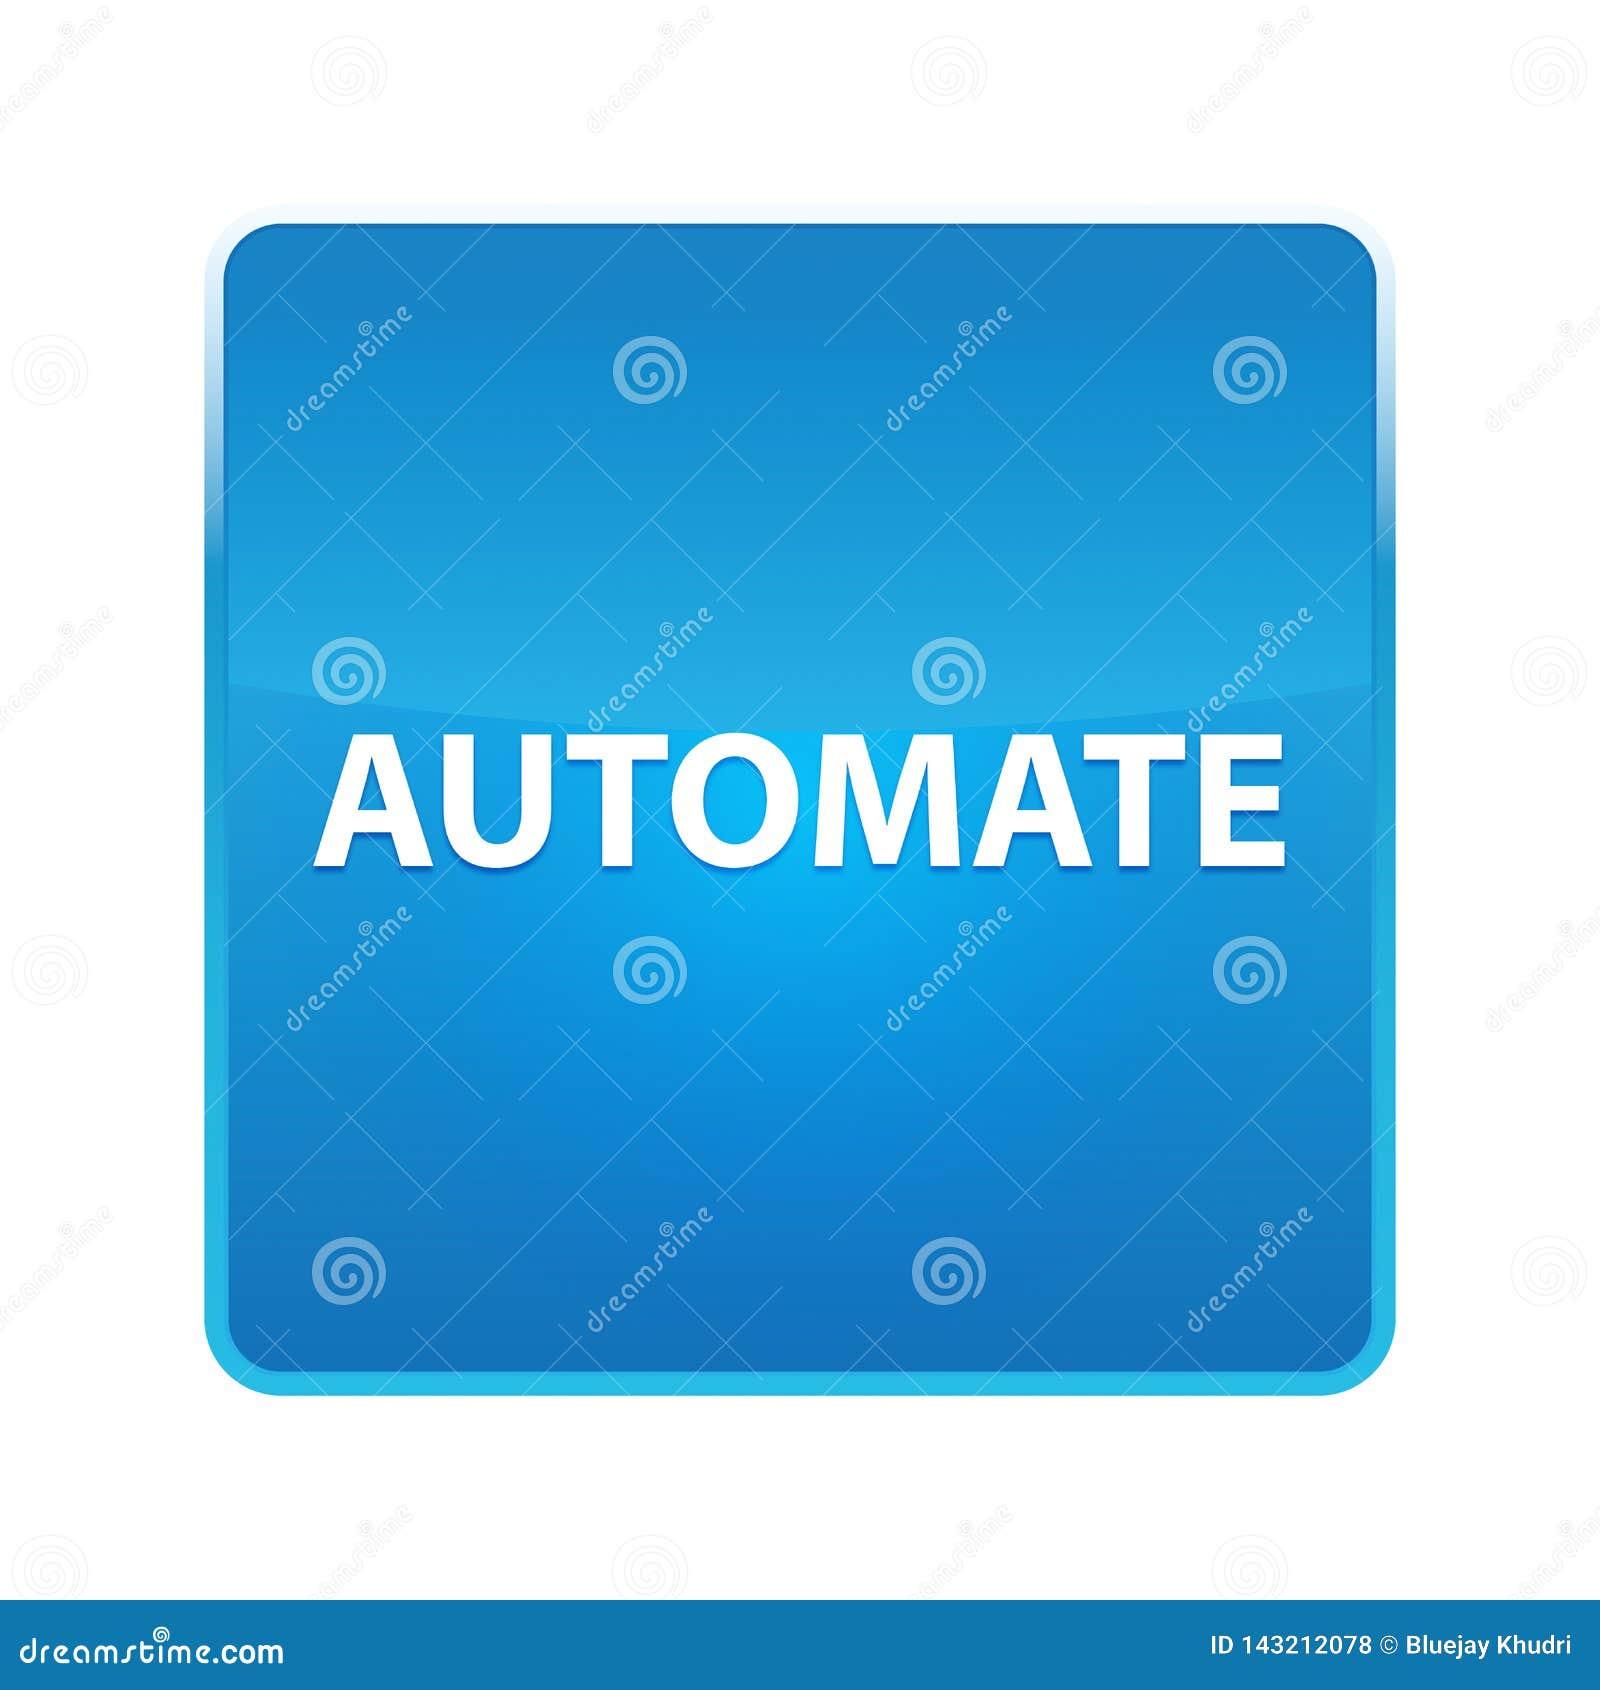 Automate shiny blue square button